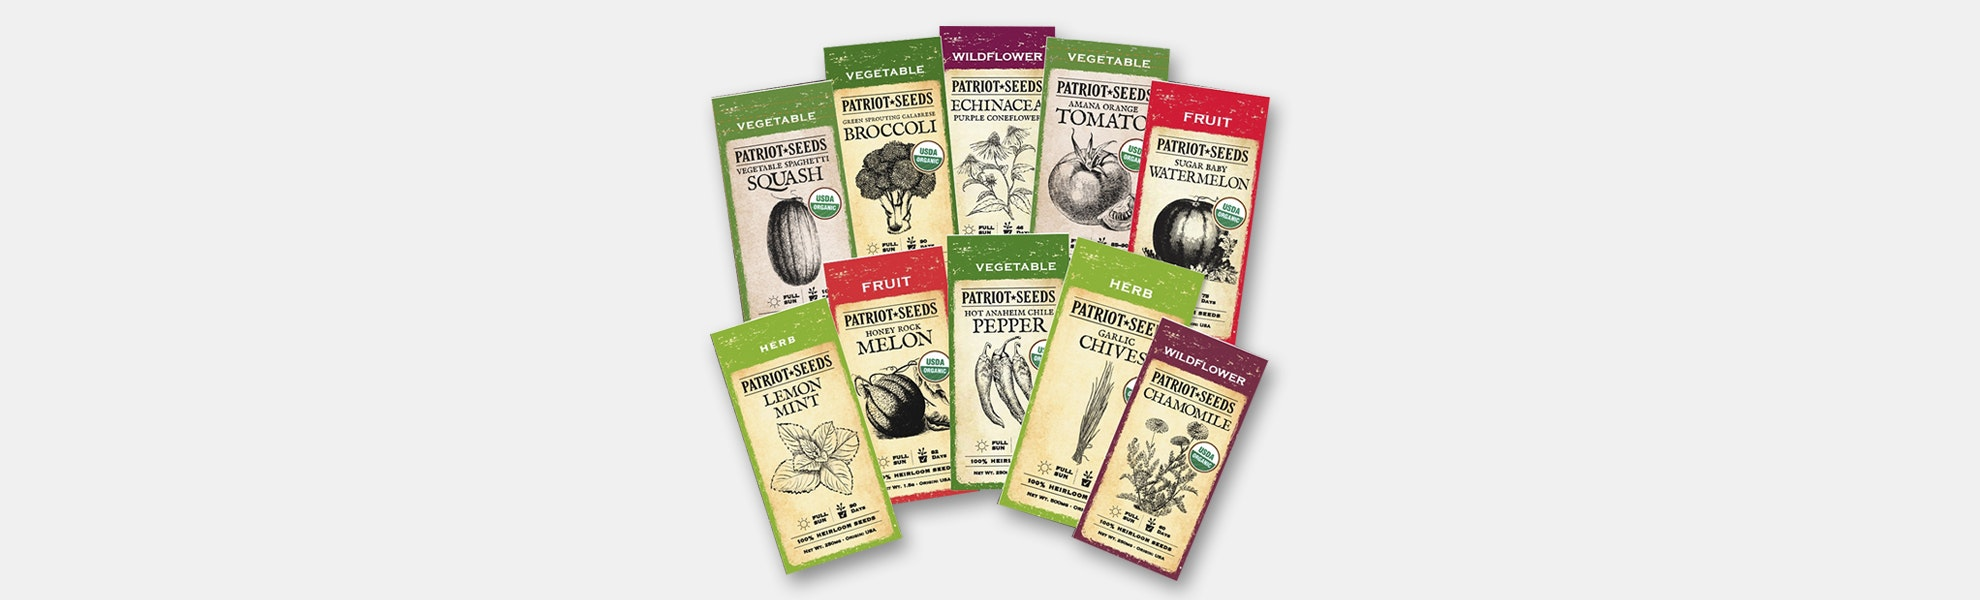 Patriot Seeds 100 Heirloom Seed Packets